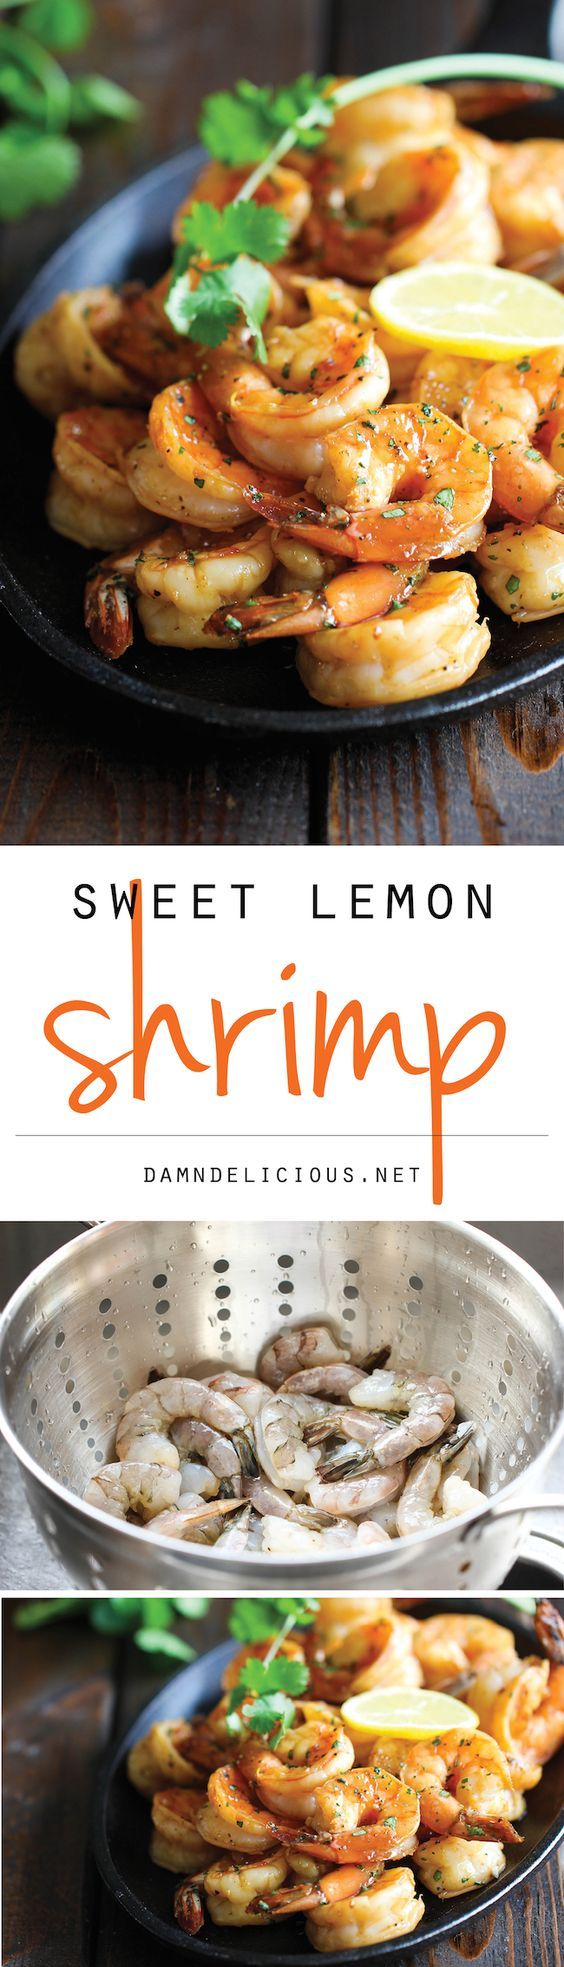 Sweet Lemon Shrimp: 1/3 cup hoisin sauce; 1/4 cup honey; 1/2 cup freshly squeezed lemon juice; Zest of 1 lemon; Kosher salt and freshly ground; black pepper, to taste; 1 1/2 pounds medium shrimp peeled and deveined; 2 tablespoons chopped fresh cilantro leaves.